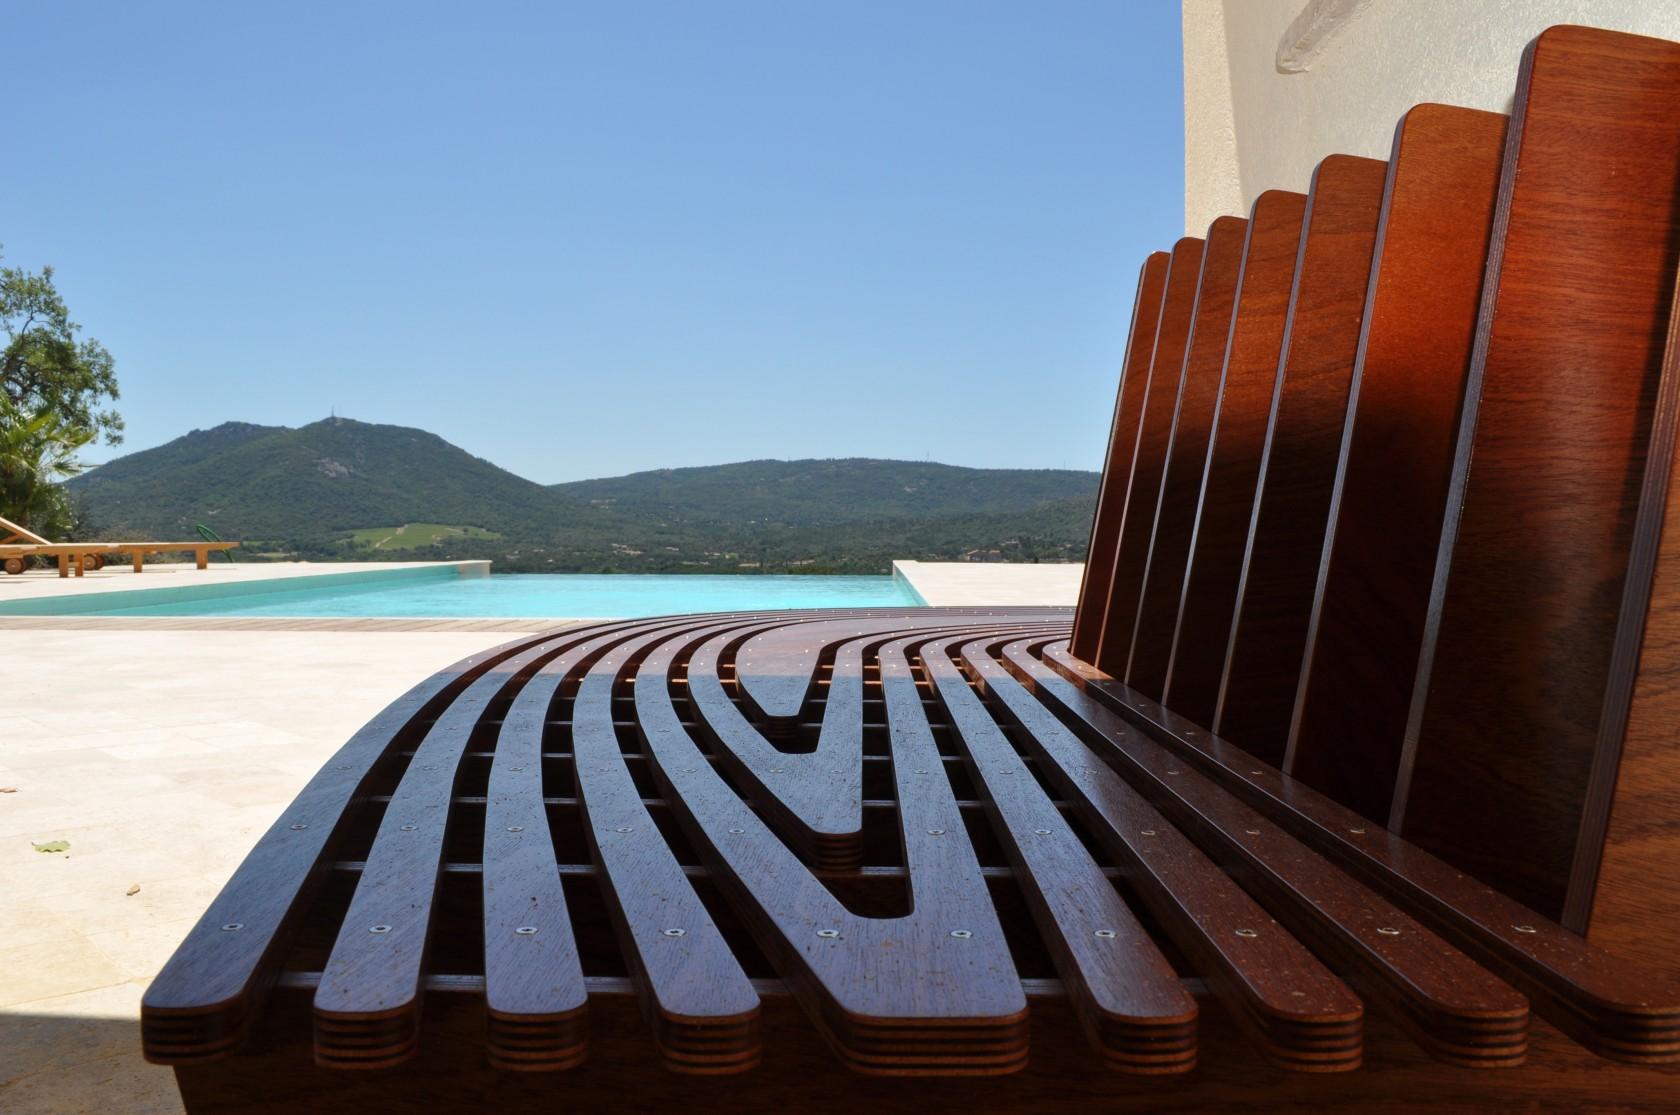 bancs pool house ludovic avenel b niste cr ateur paris. Black Bedroom Furniture Sets. Home Design Ideas